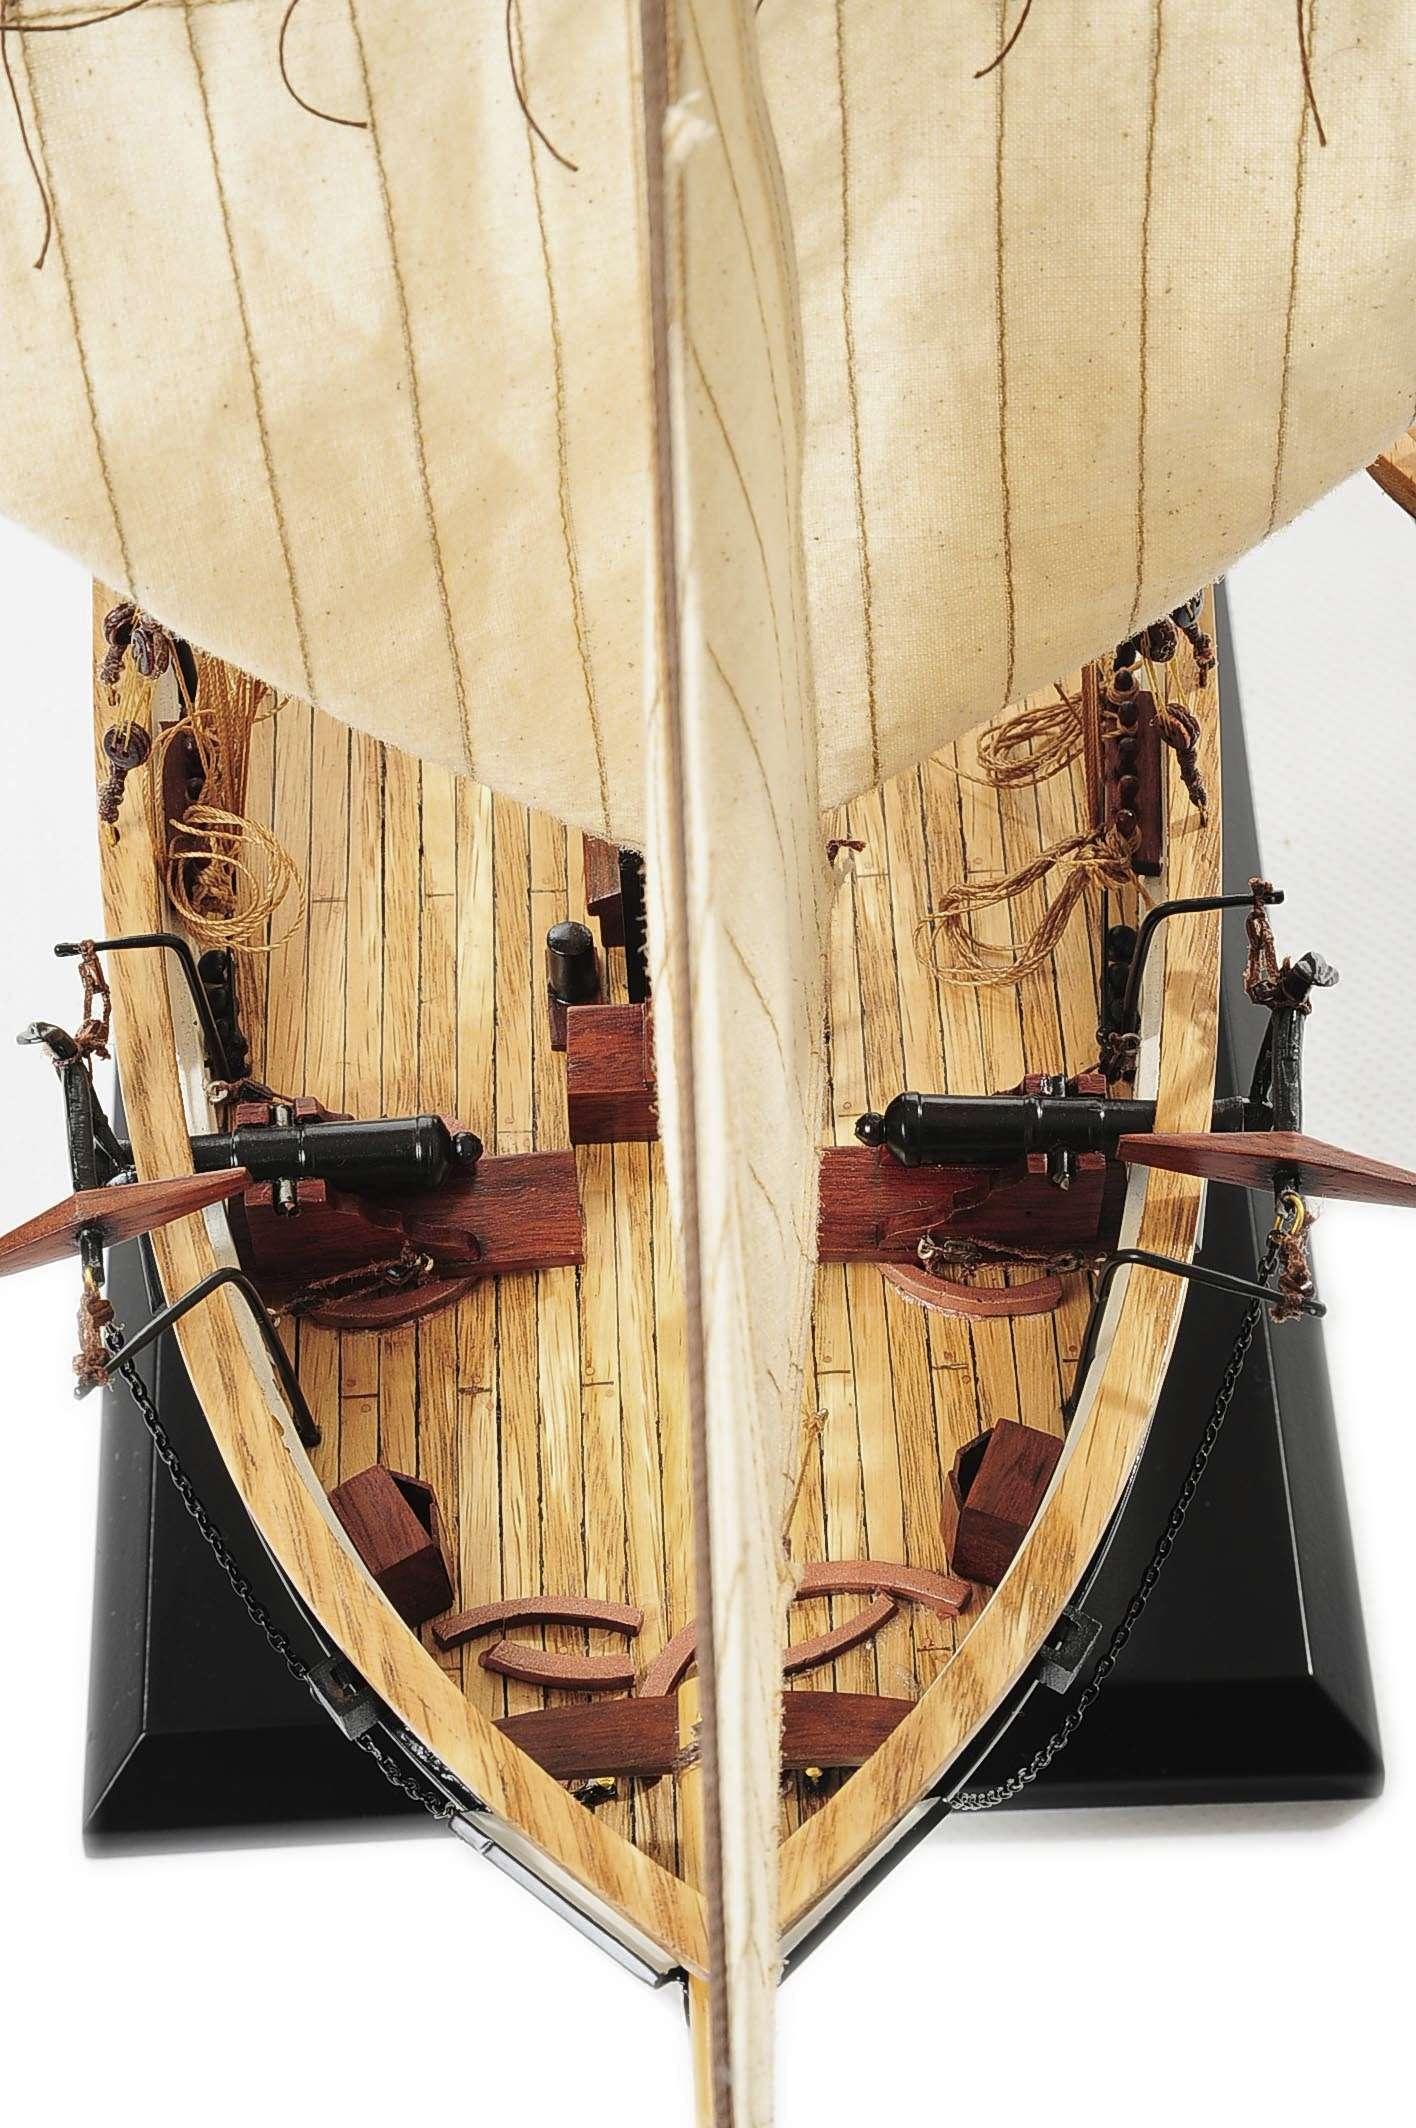 1428-4665-HMS-Cockchafer-2-Model-Boat